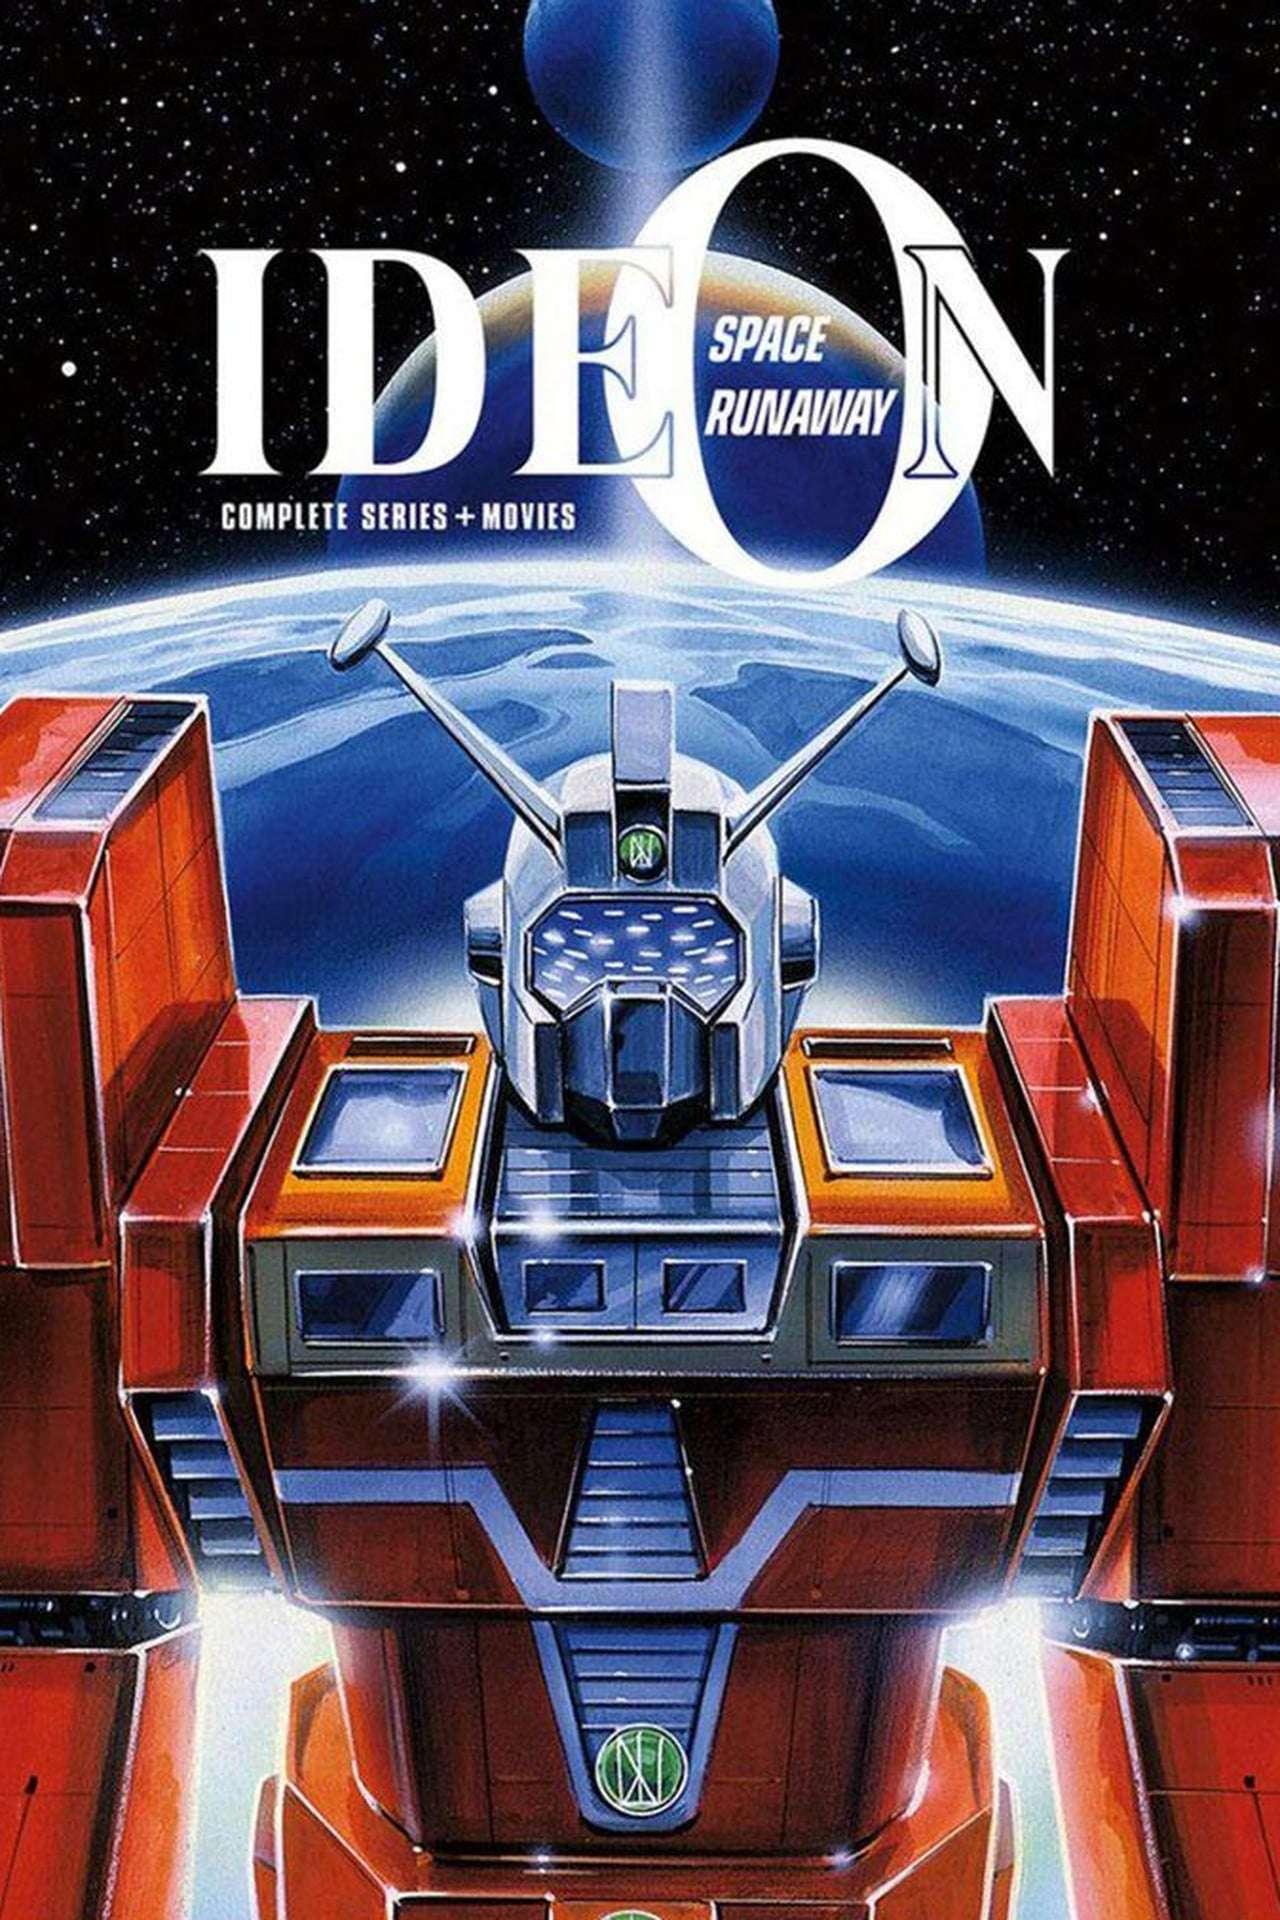 Space Runaway Ideon - 1980